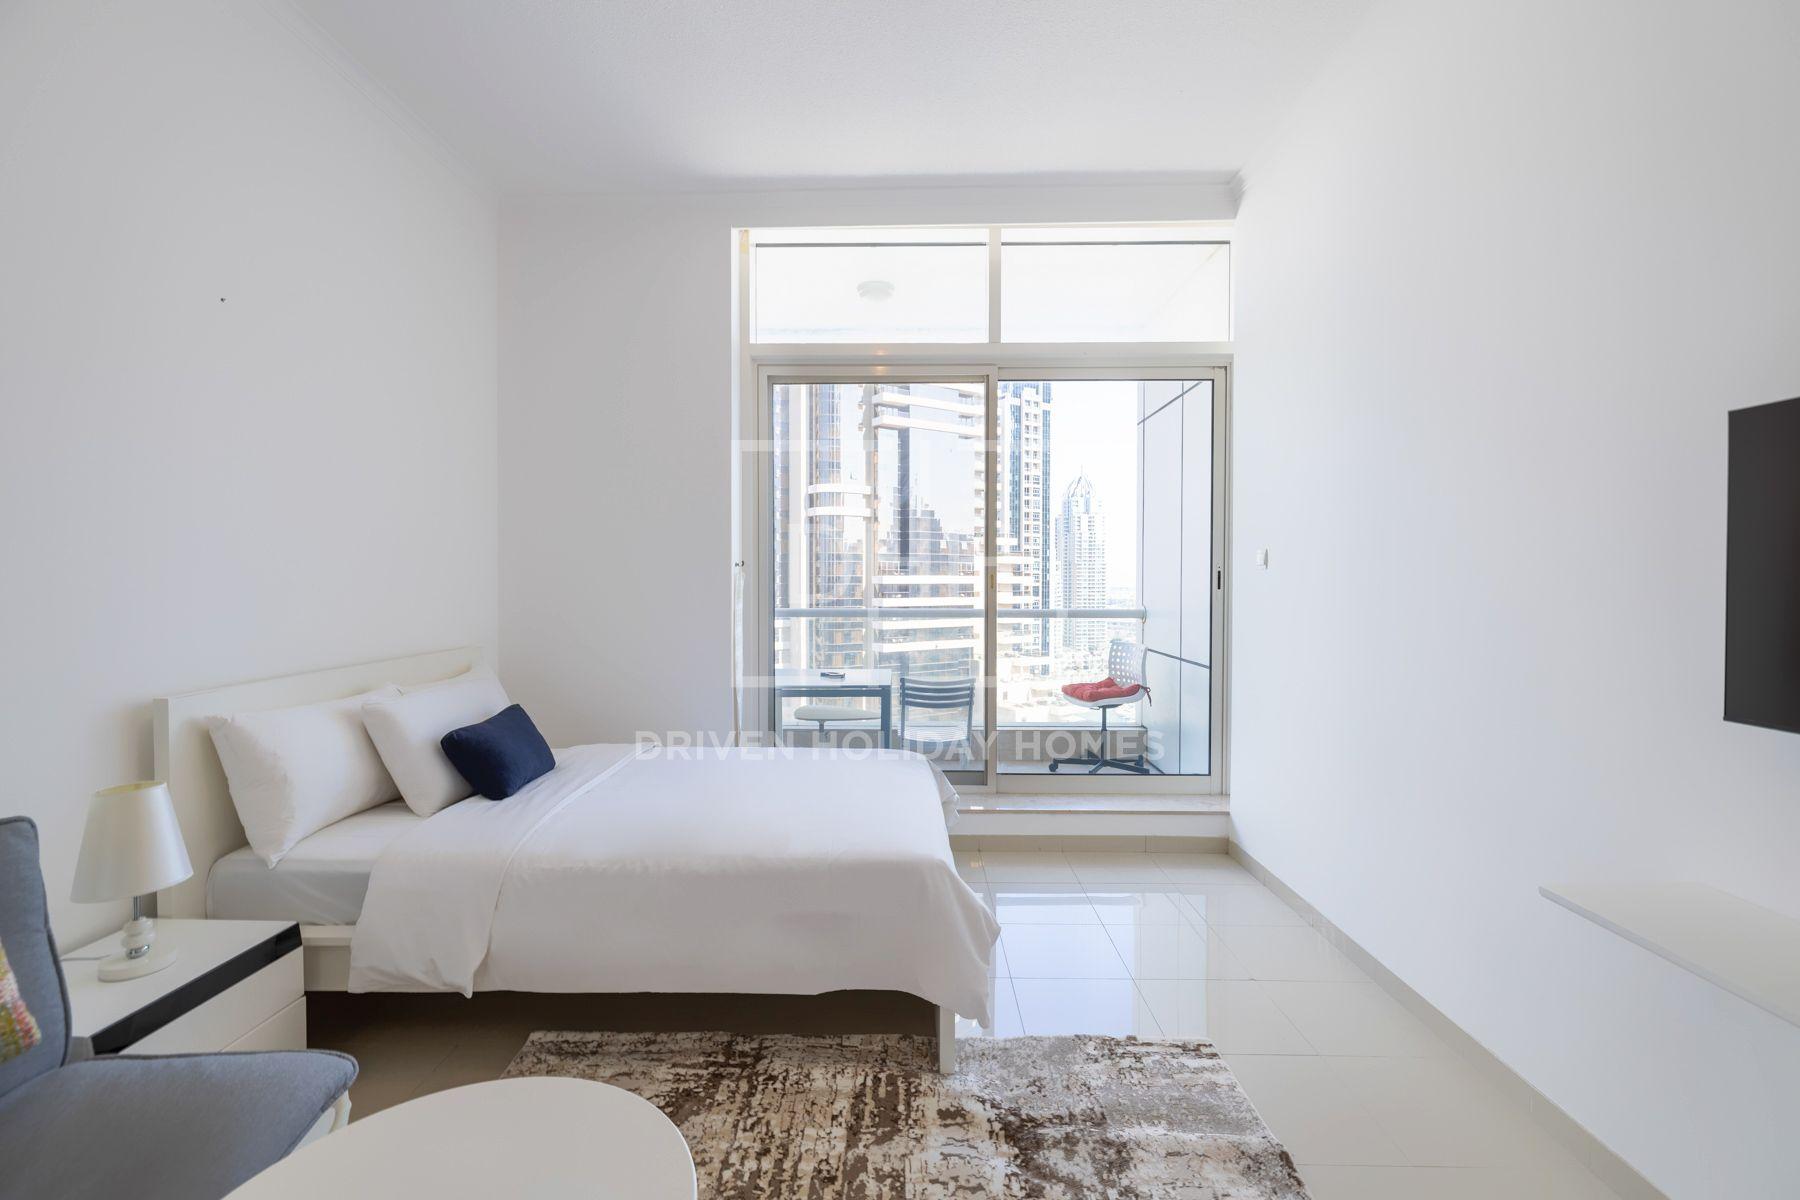 Studio for Rent in Botanica Tower - Dubai Marina